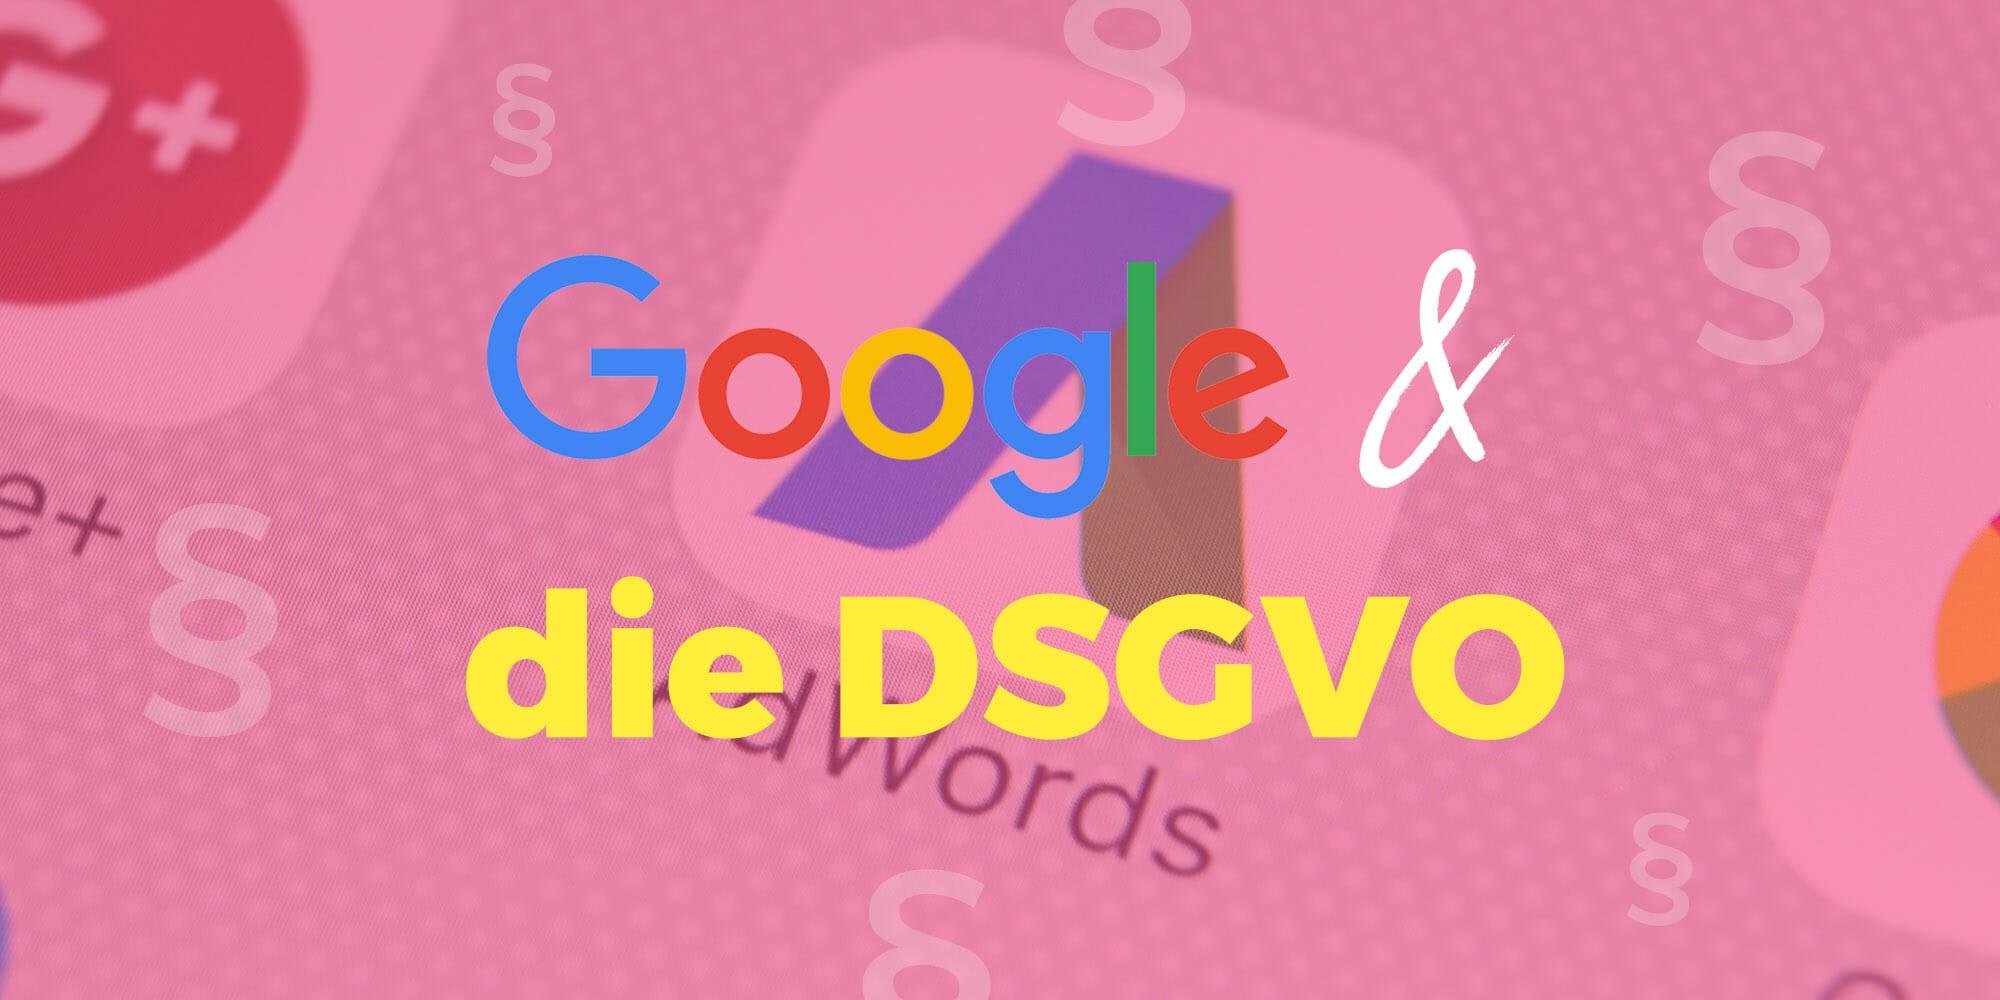 Google DSGVO